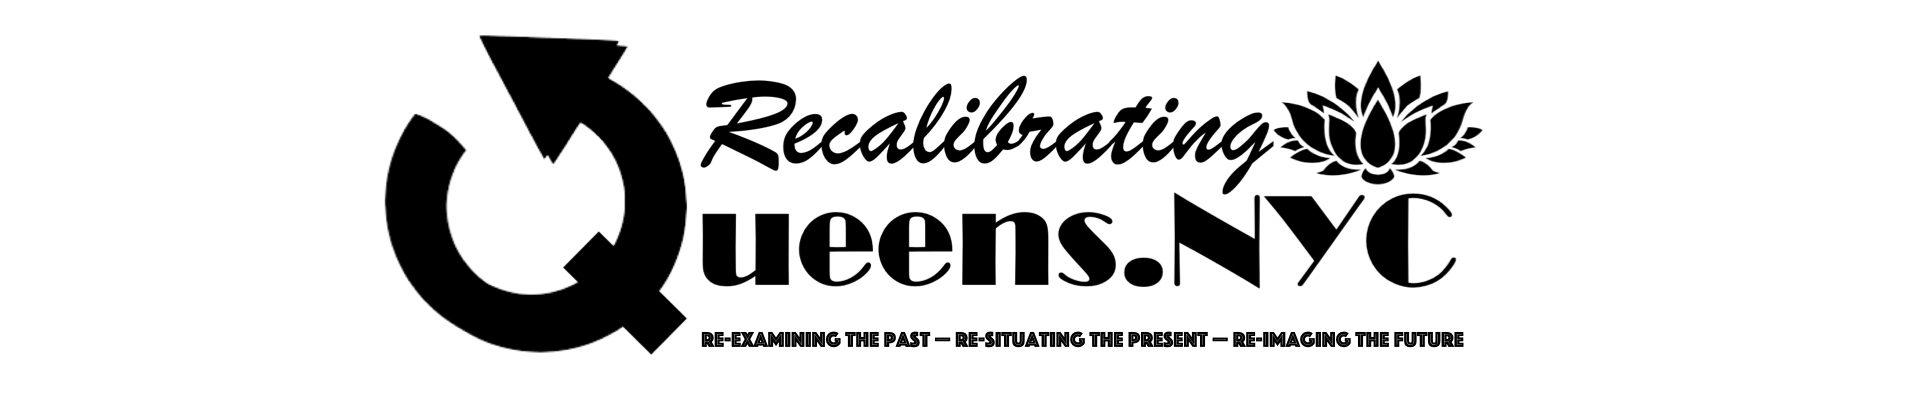 Recalibrating Queens